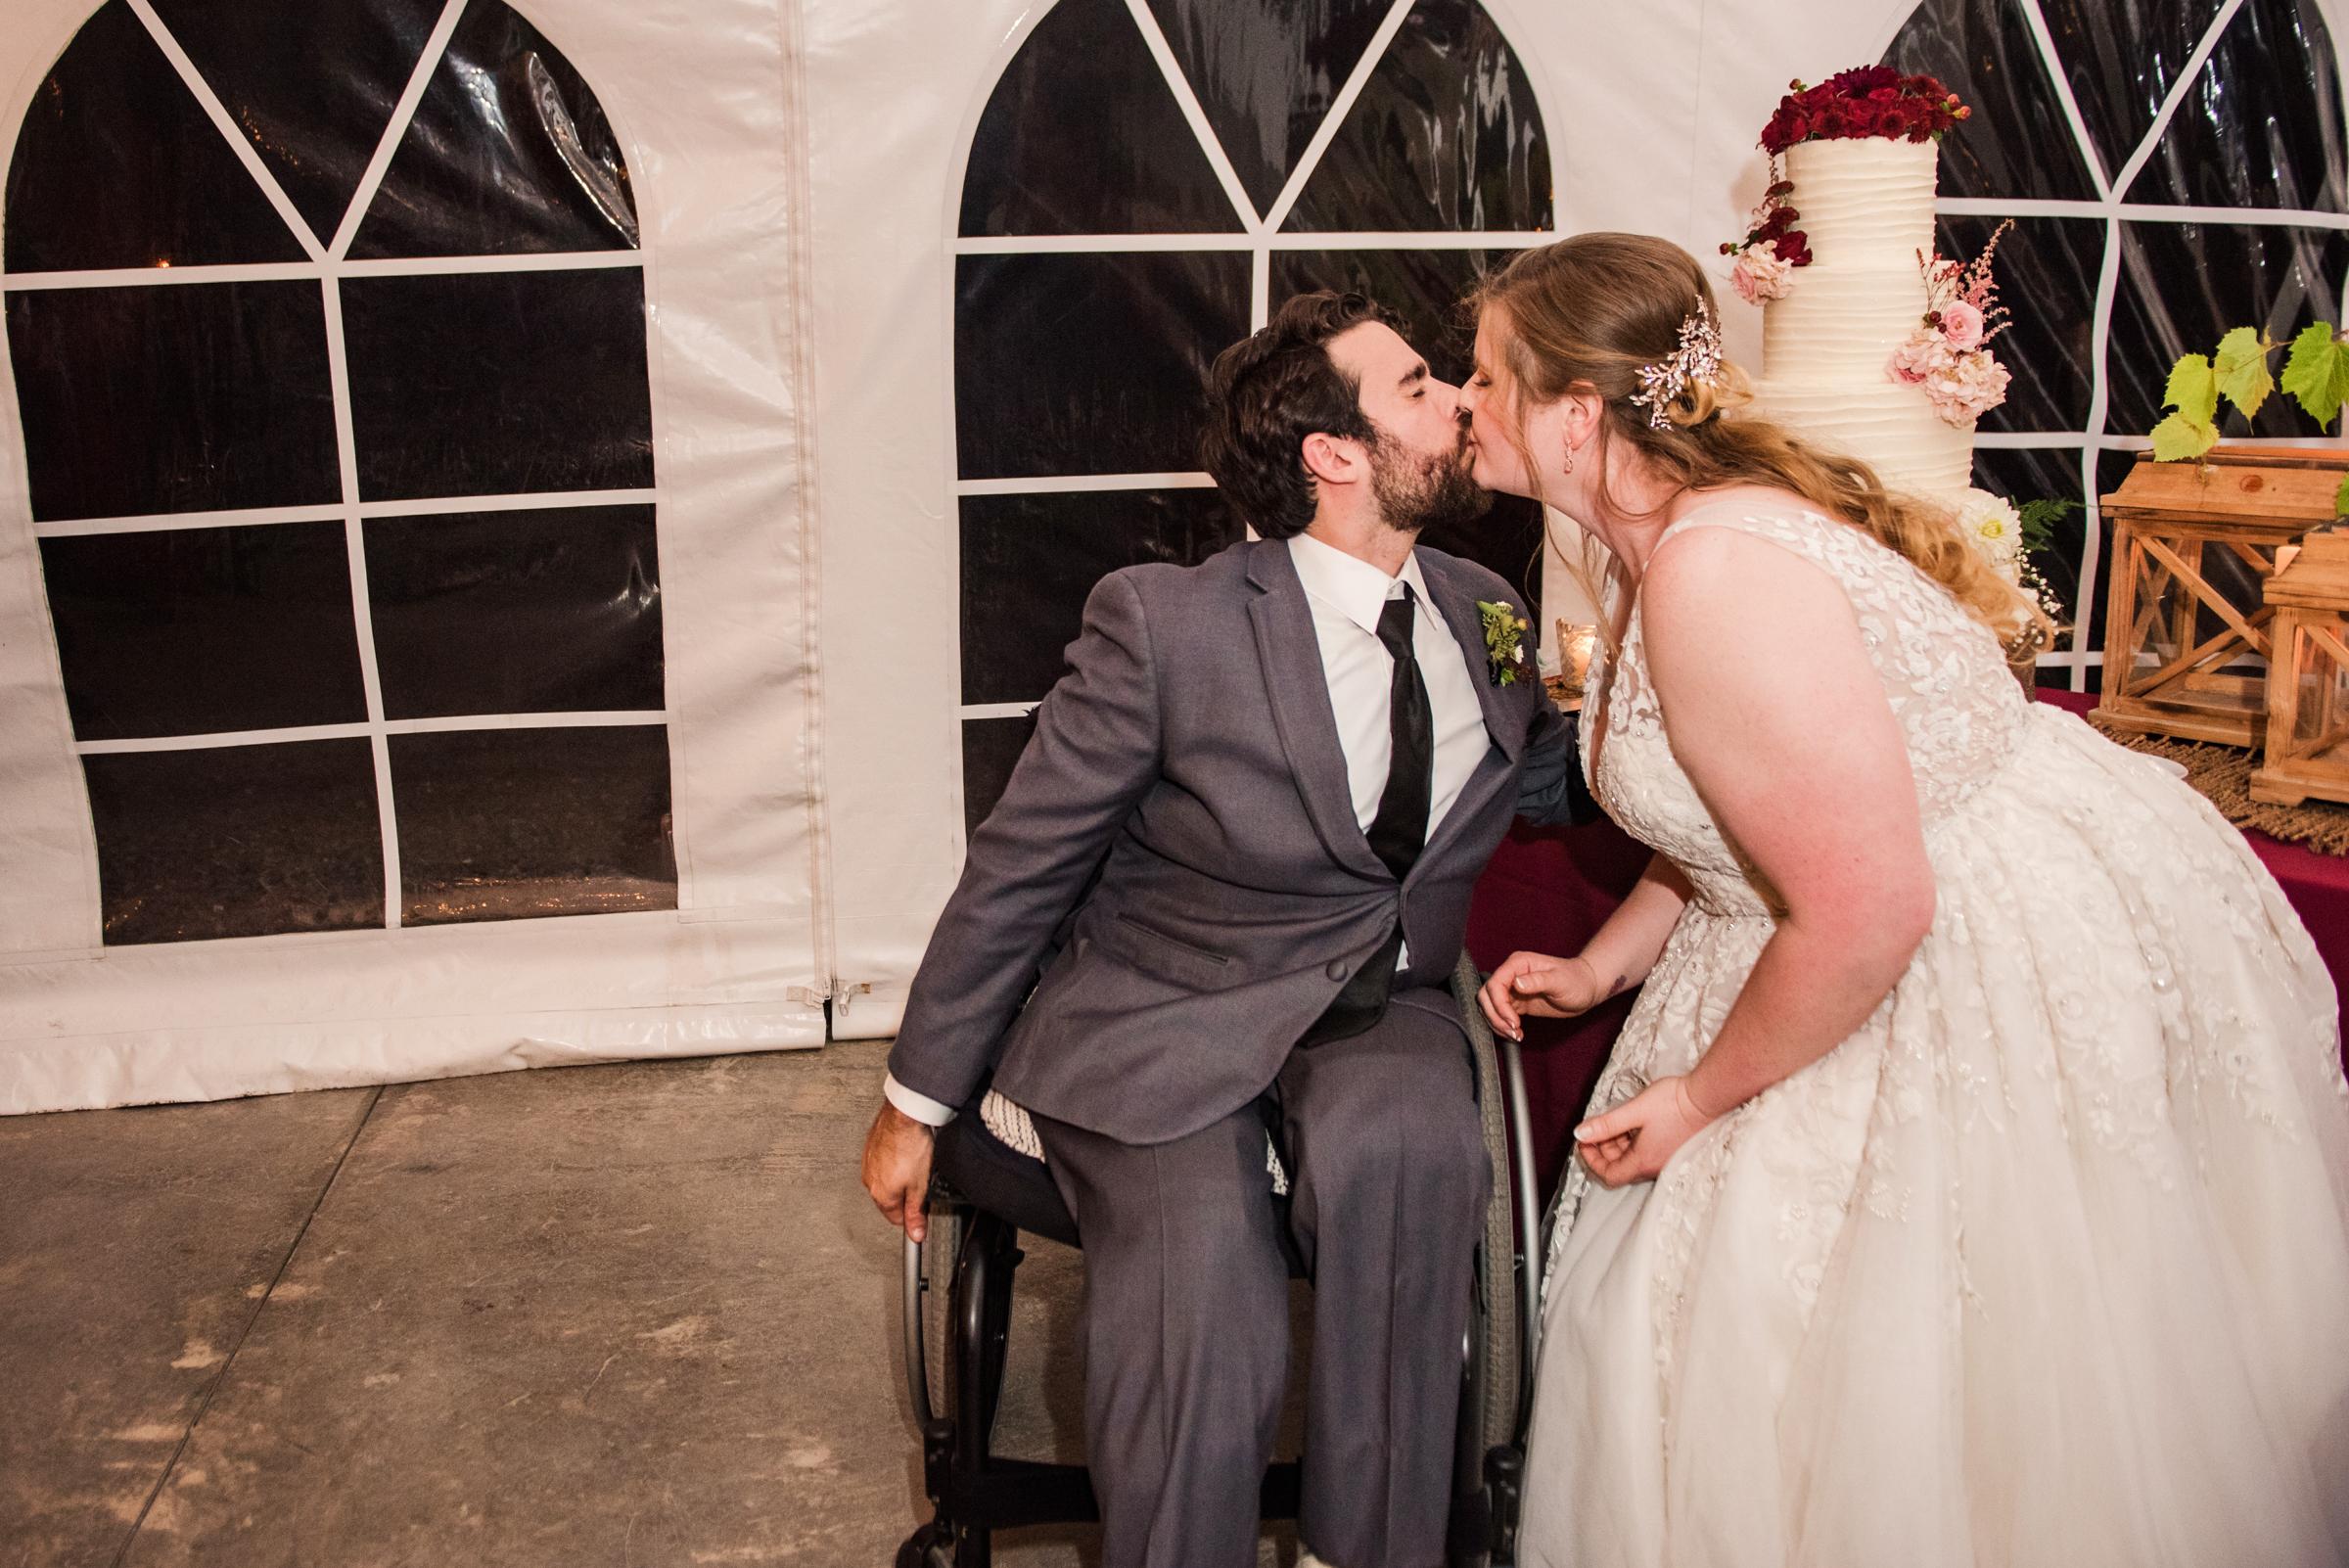 Zugibe_Vineyards_Finger_Lakes_Wedding_JILL_STUDIO_Rochester_NY_Photographer_DSC_4462.jpg